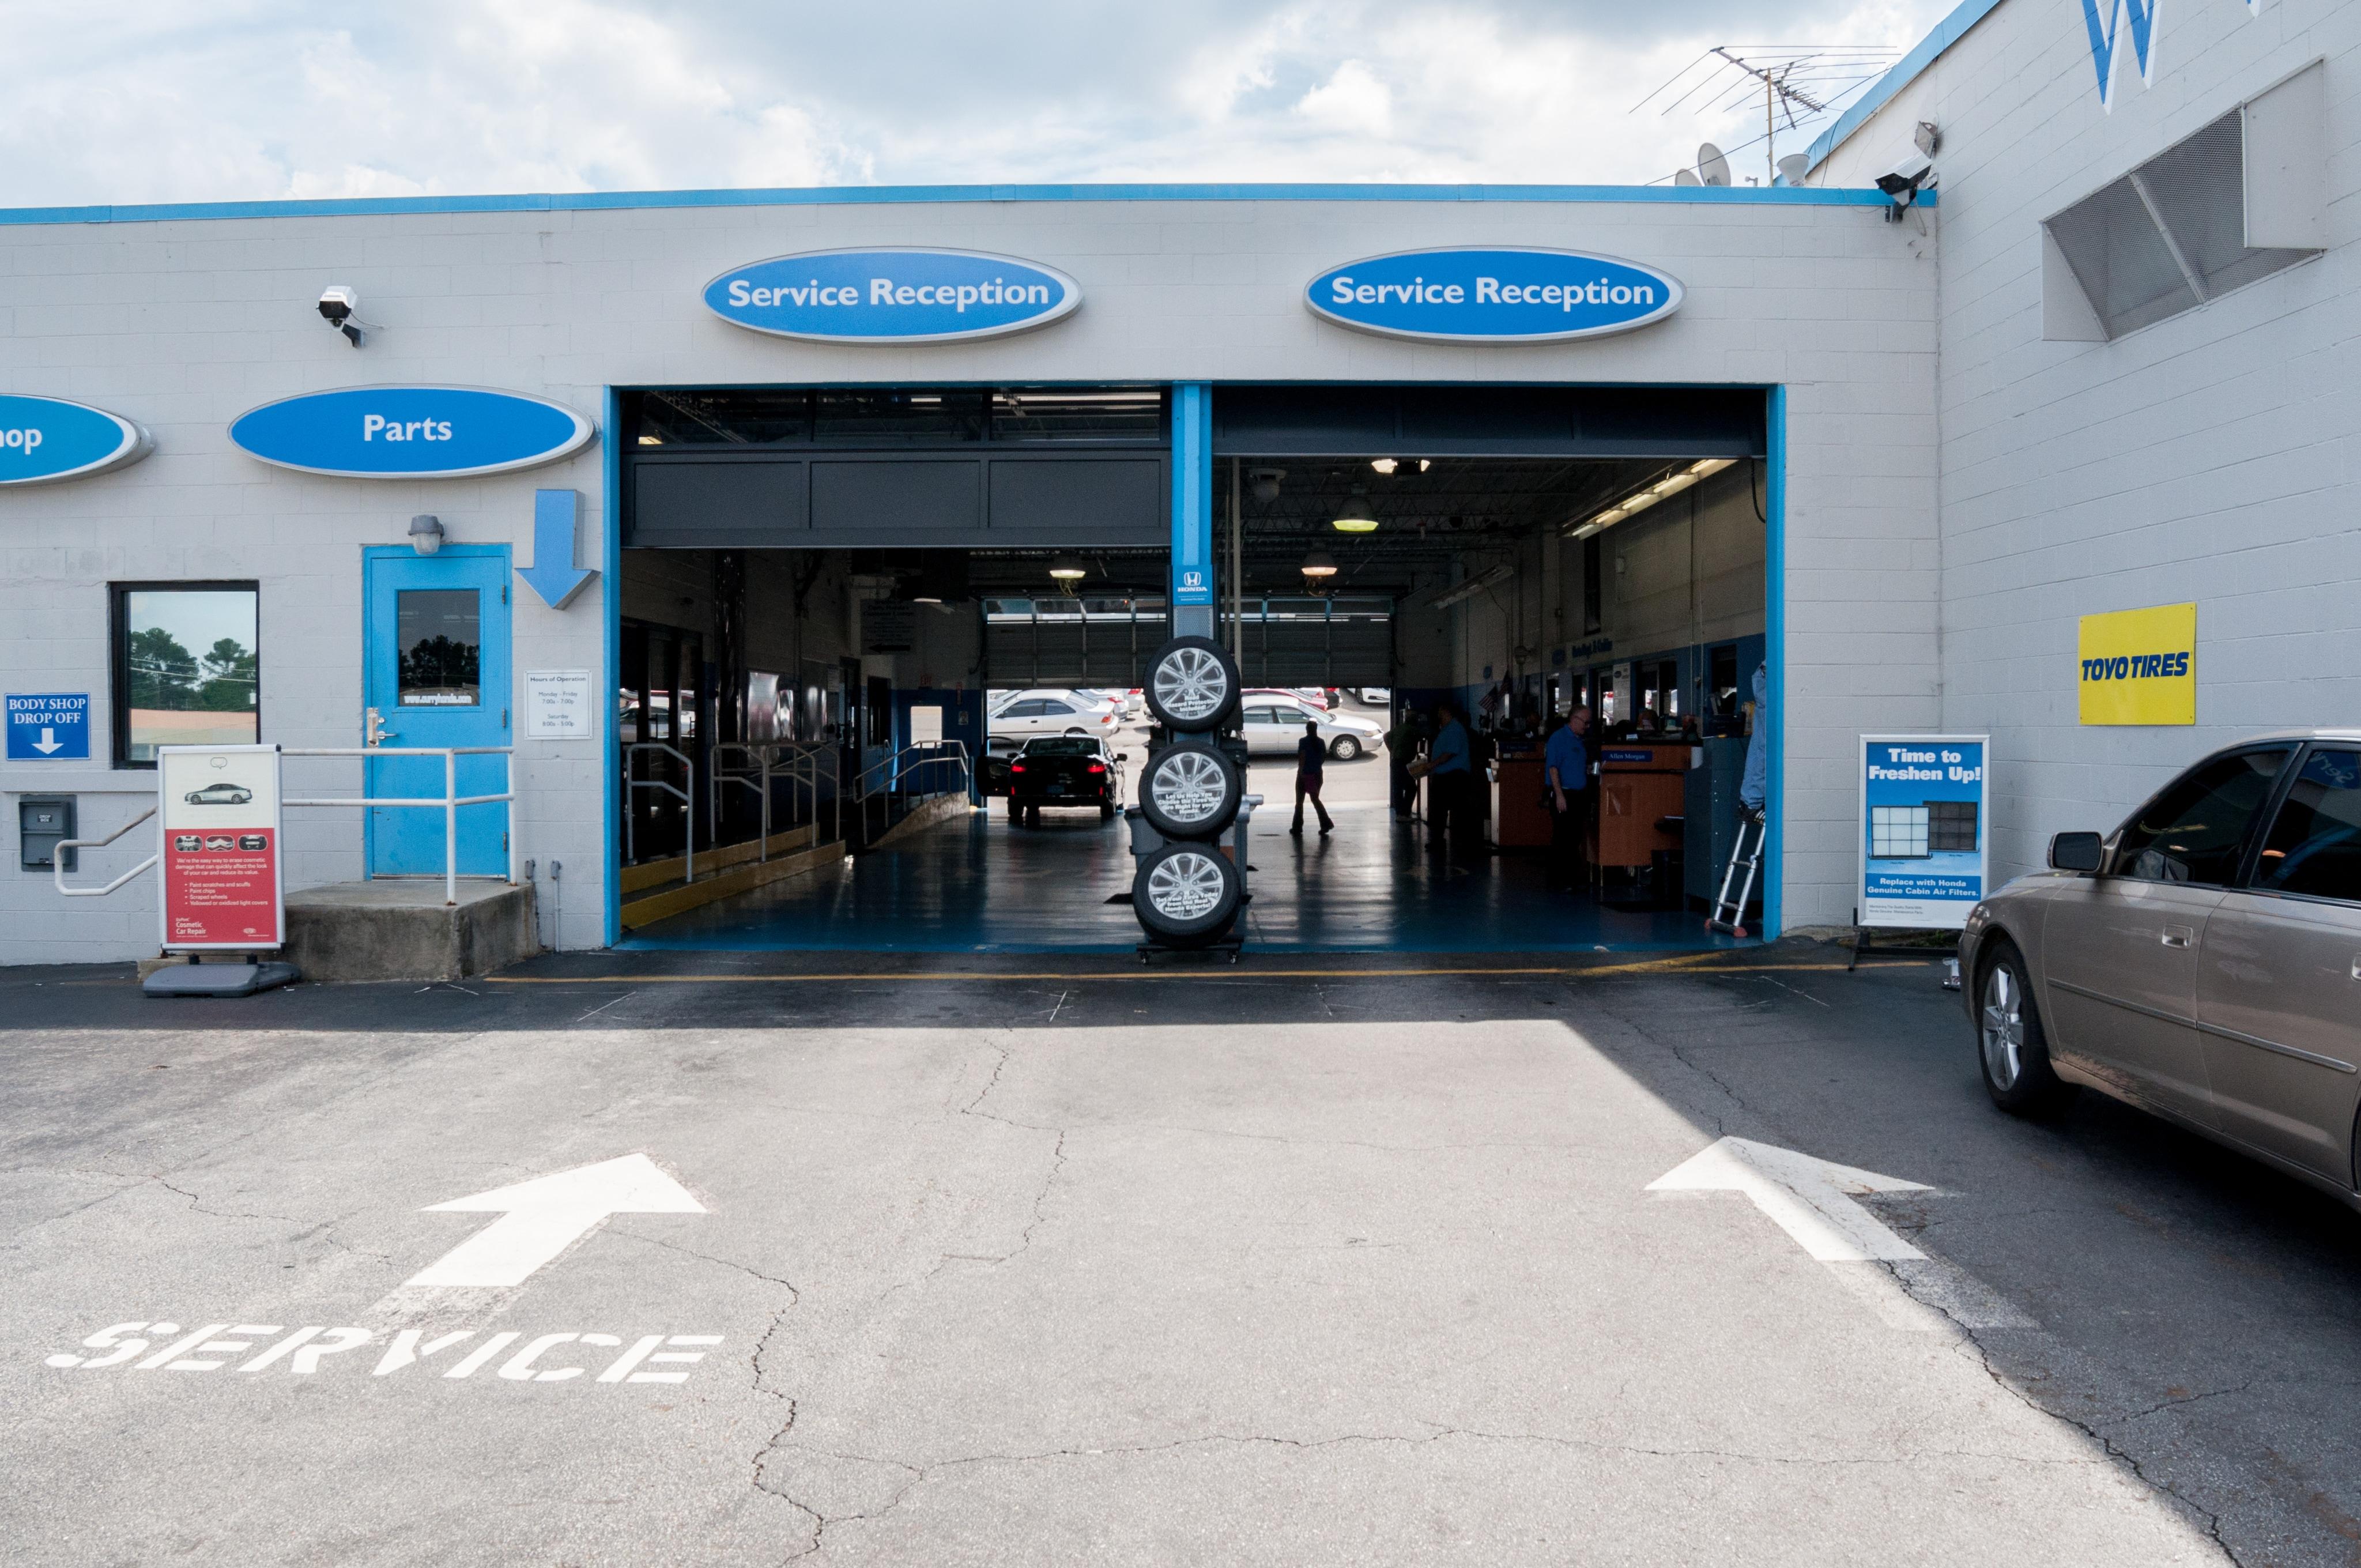 Curry honda atlanta new honda dealership in chamblee ga for Honda dealership hours